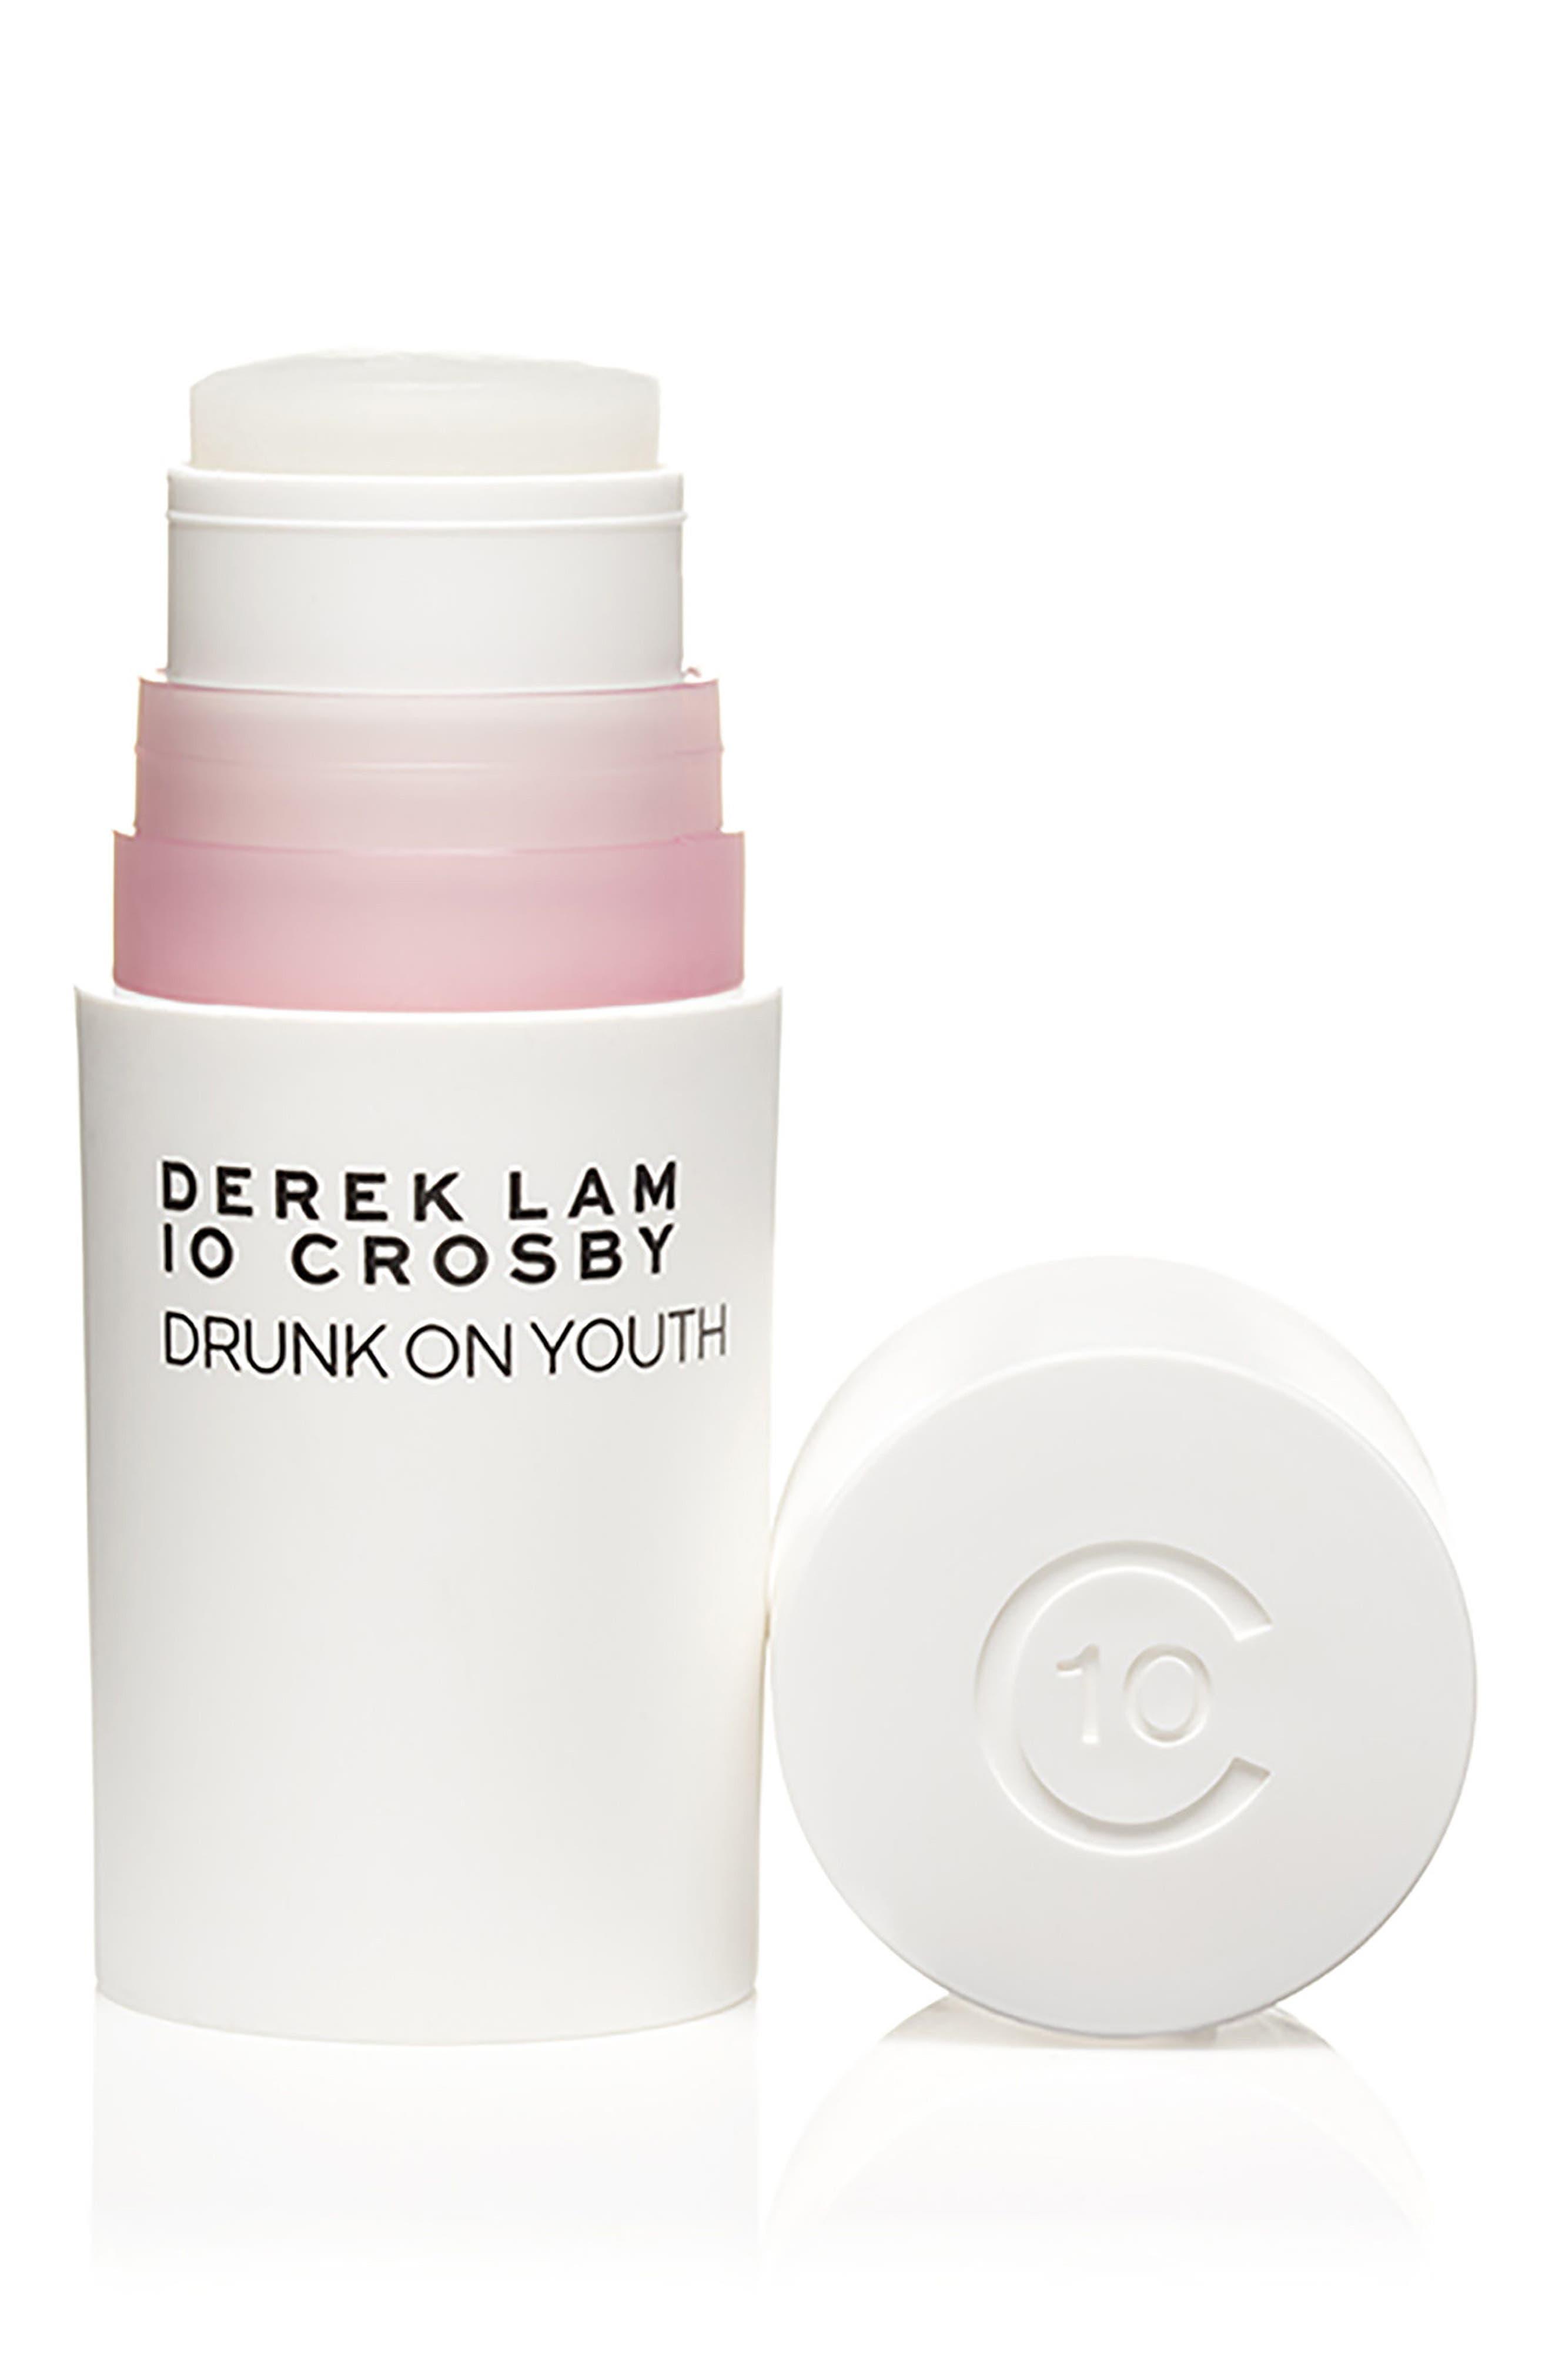 Drunk on Youth Parfum Stick,                         Main,                         color, No Color